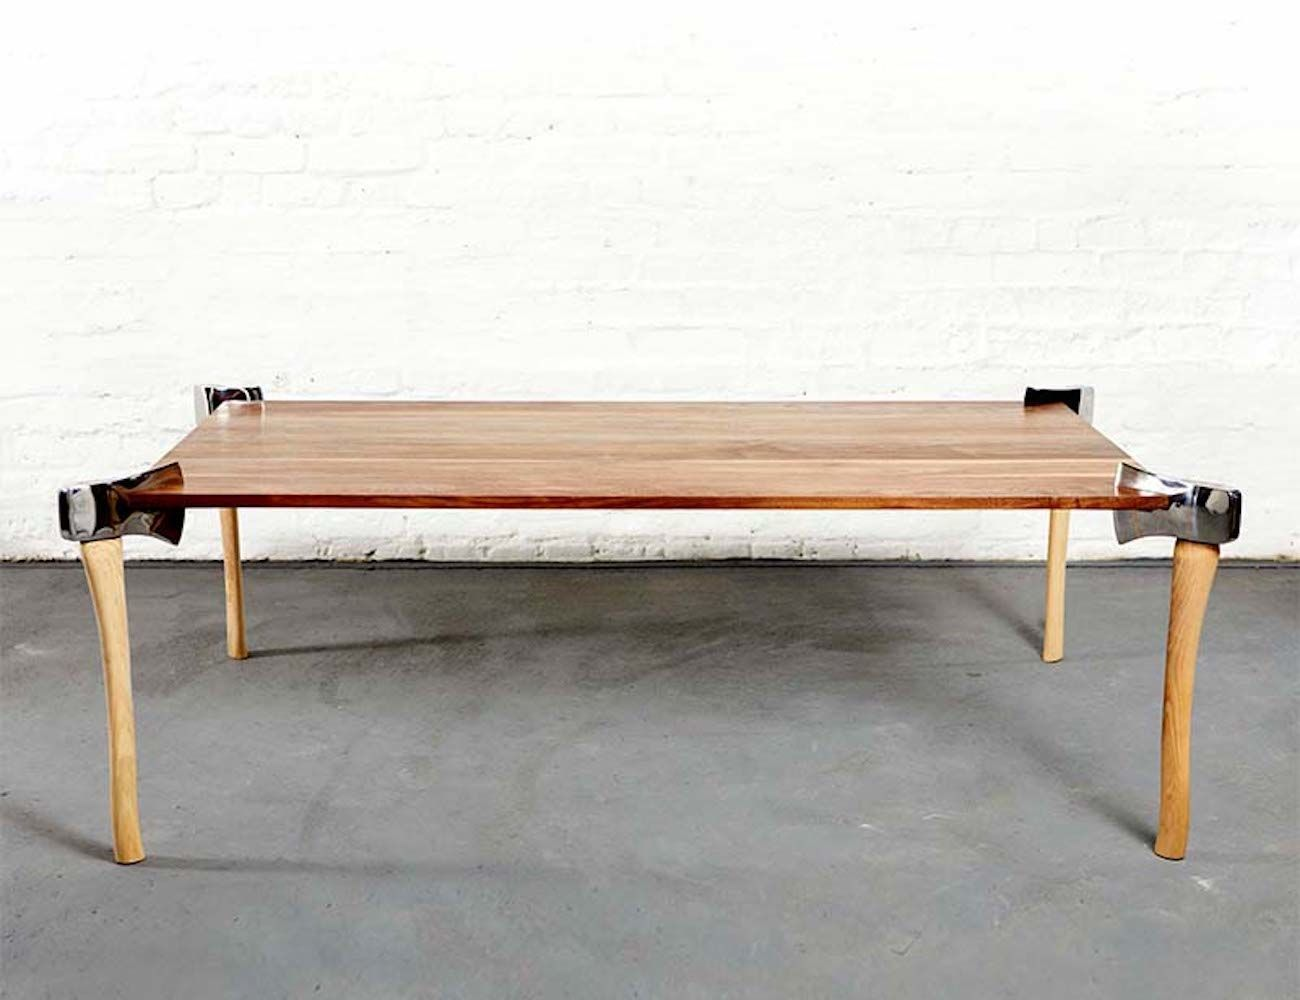 Woodsman Wood Axe Table » Gadget Flow